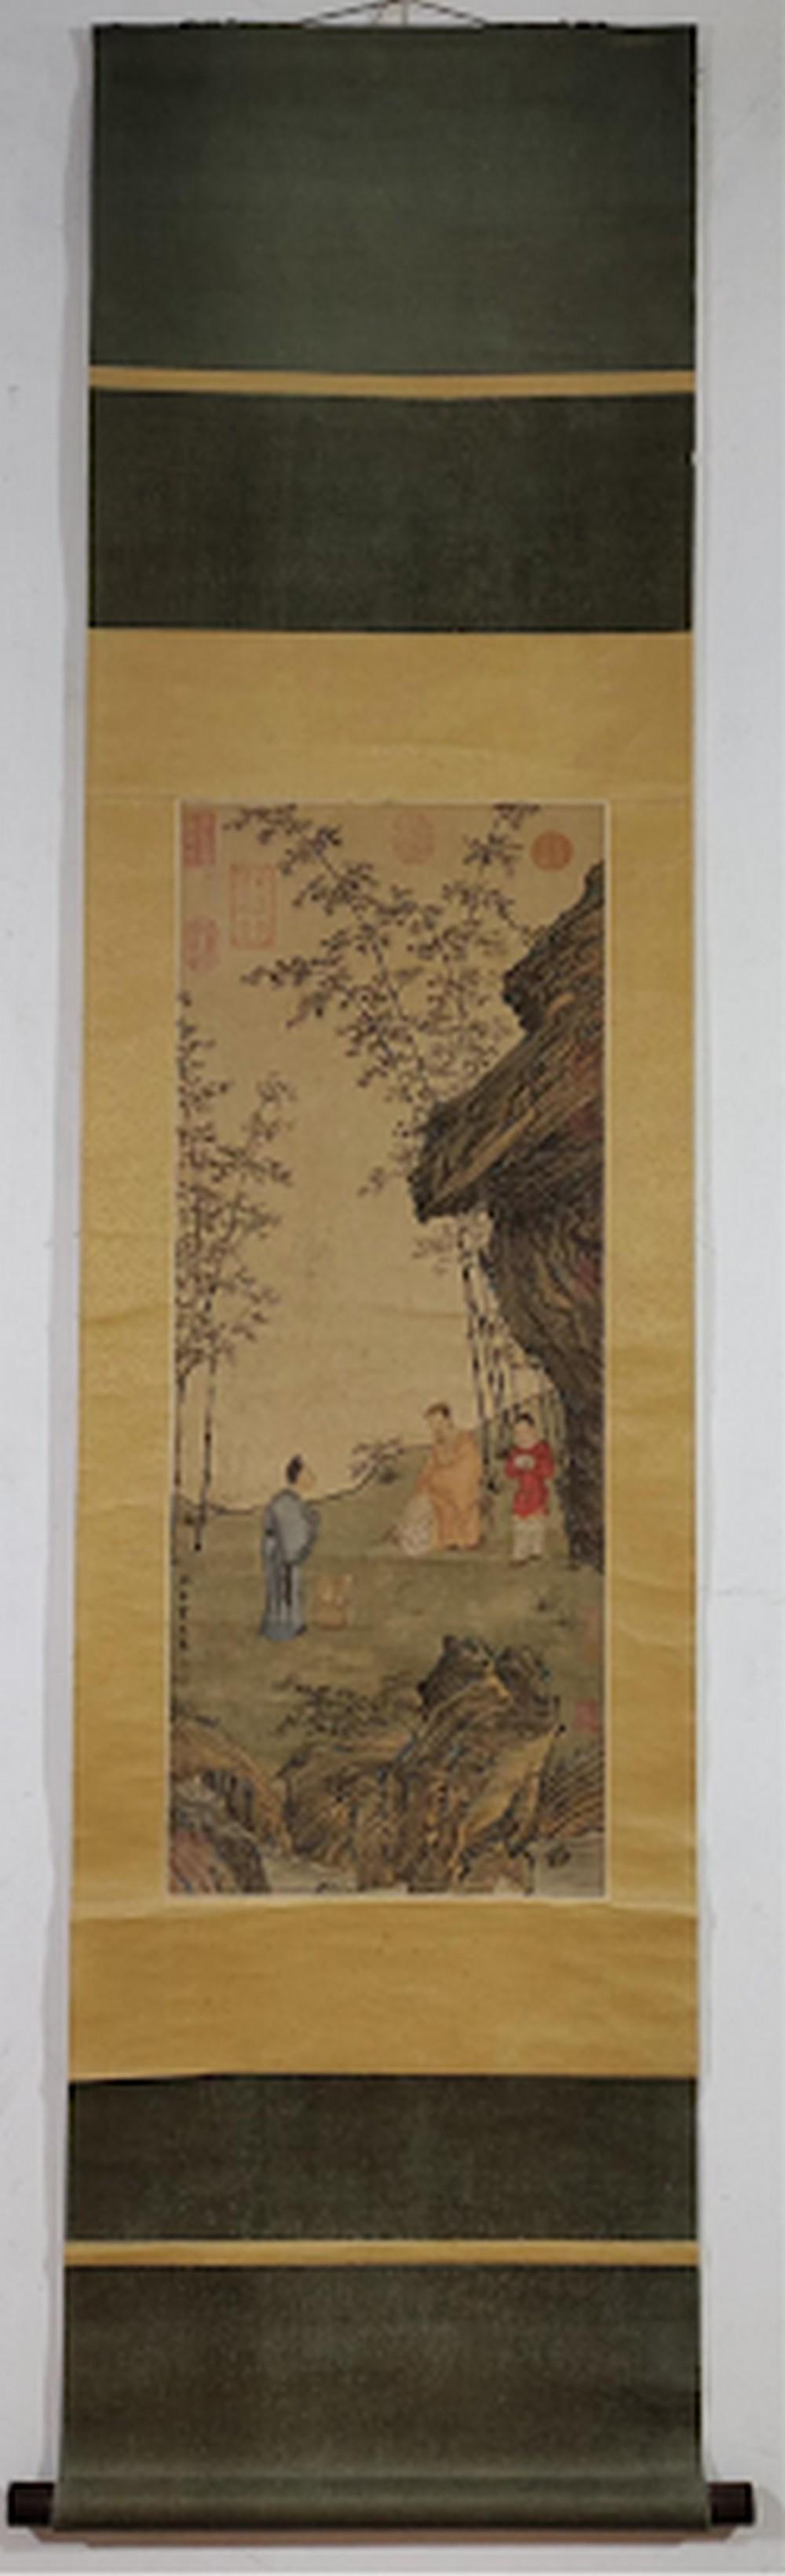 Party Silk Scroll by Qiu Ying